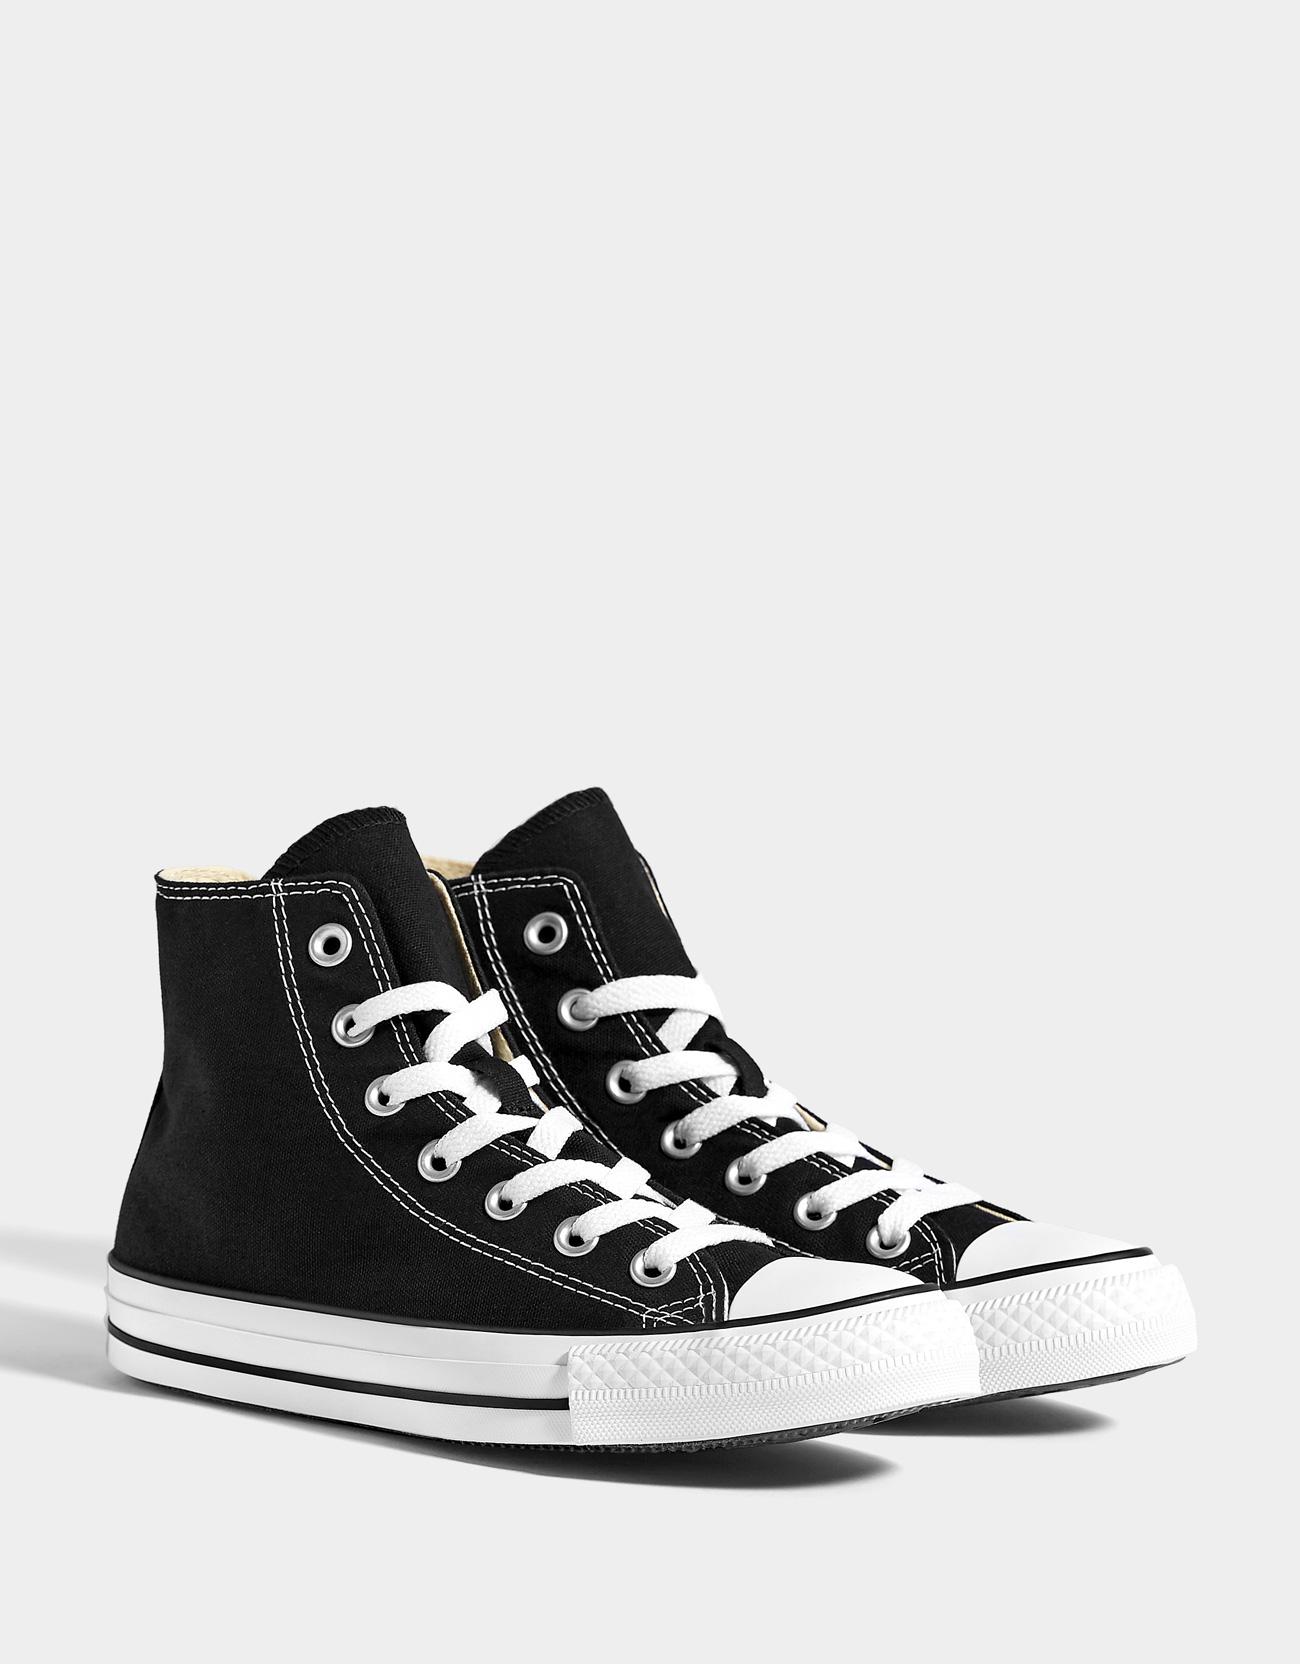 8f0e105b4398 CONVERSE CHUCK TAYLOR ALL STAR high top canvas sneakers - New - Bershka  Slovenia